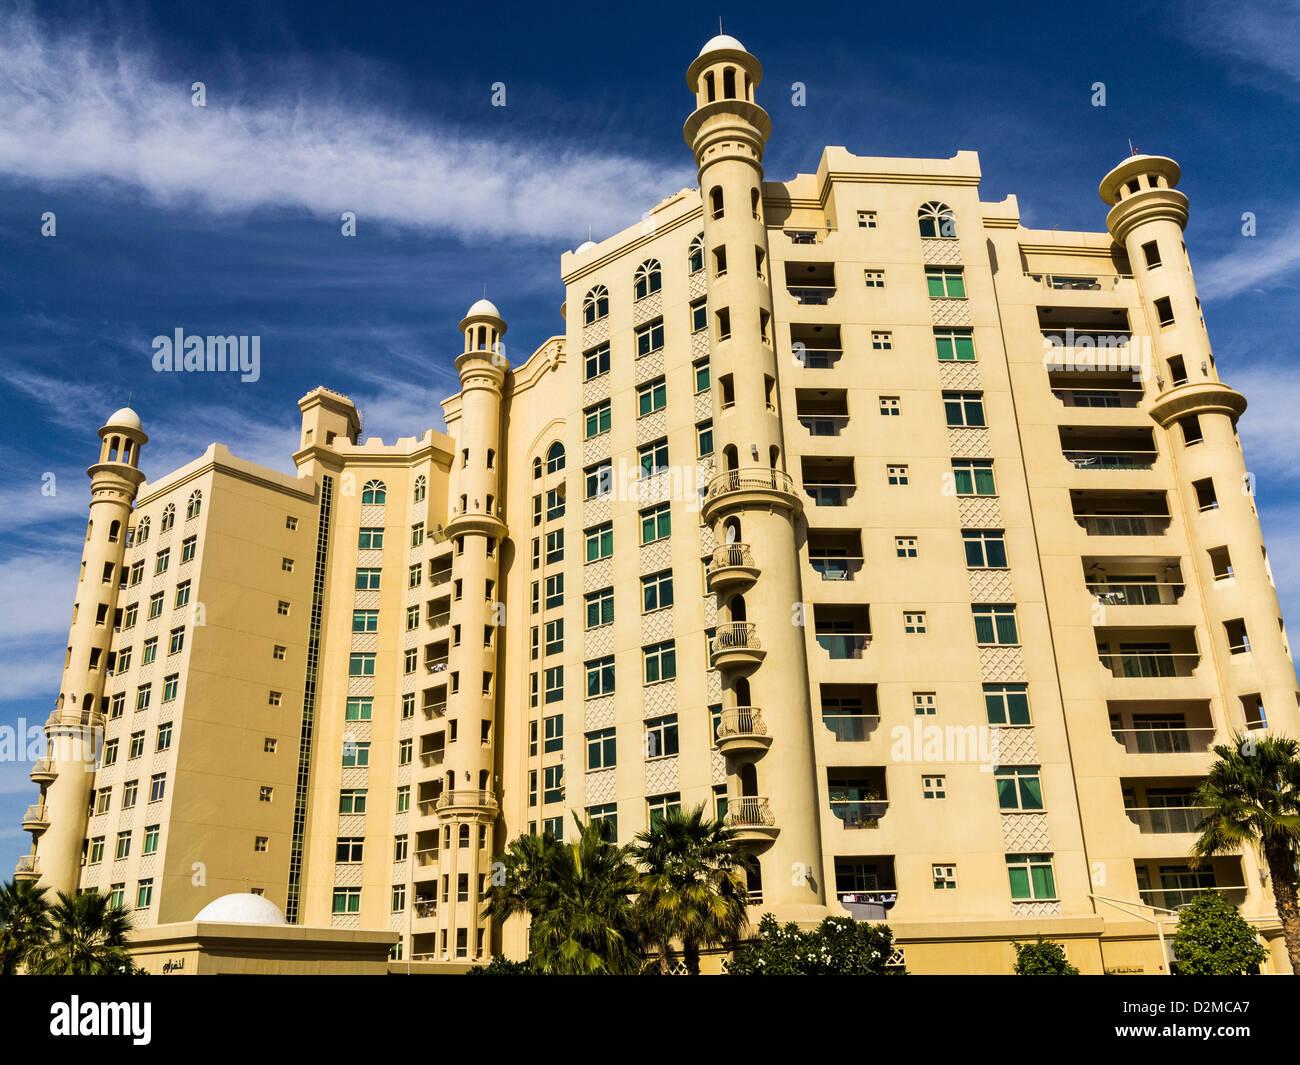 Shoreline Apartments, Dubai - Stock Image